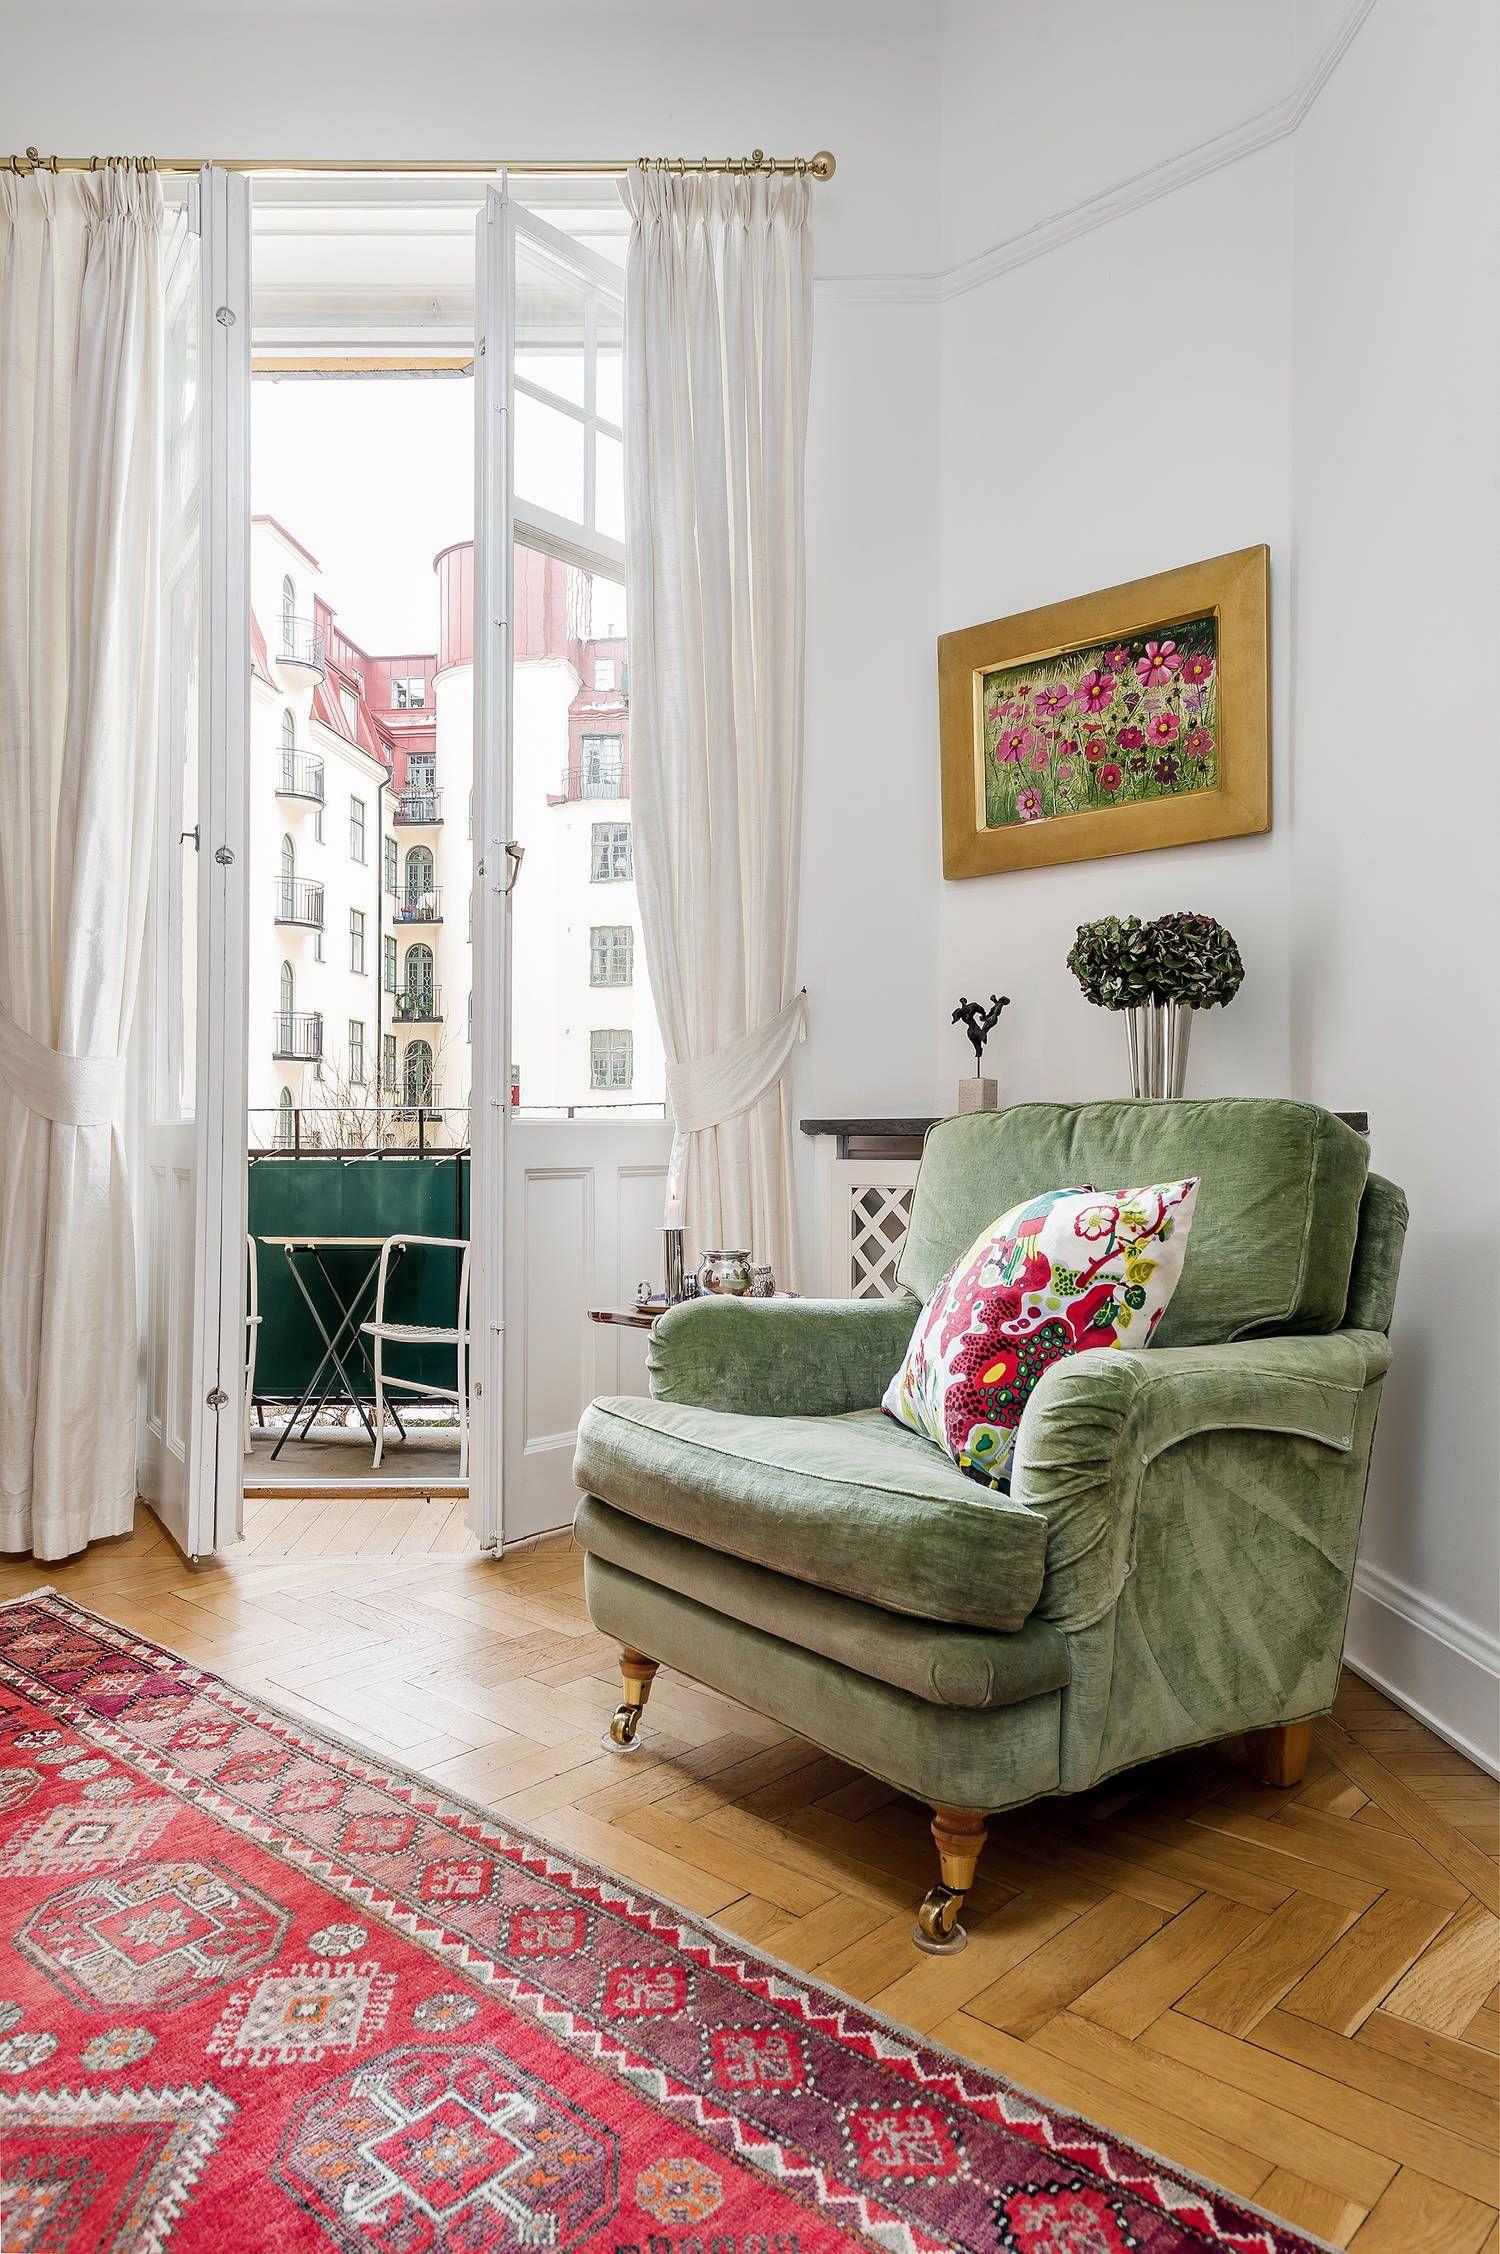 Via perjansson sweet home make sweethomemake interior decoration ideas living also rh pinterest